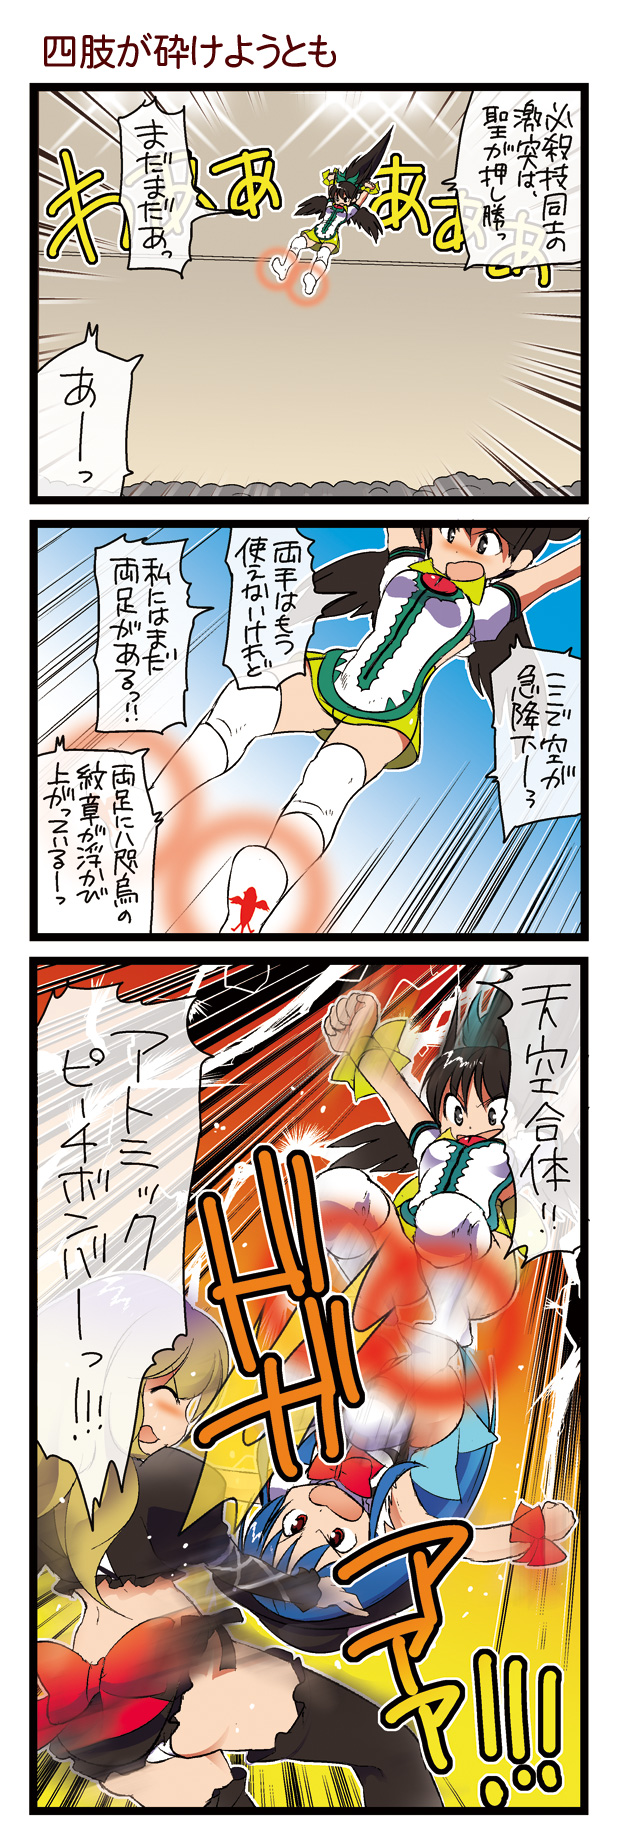 Tag Dream, a Touhou Doujin